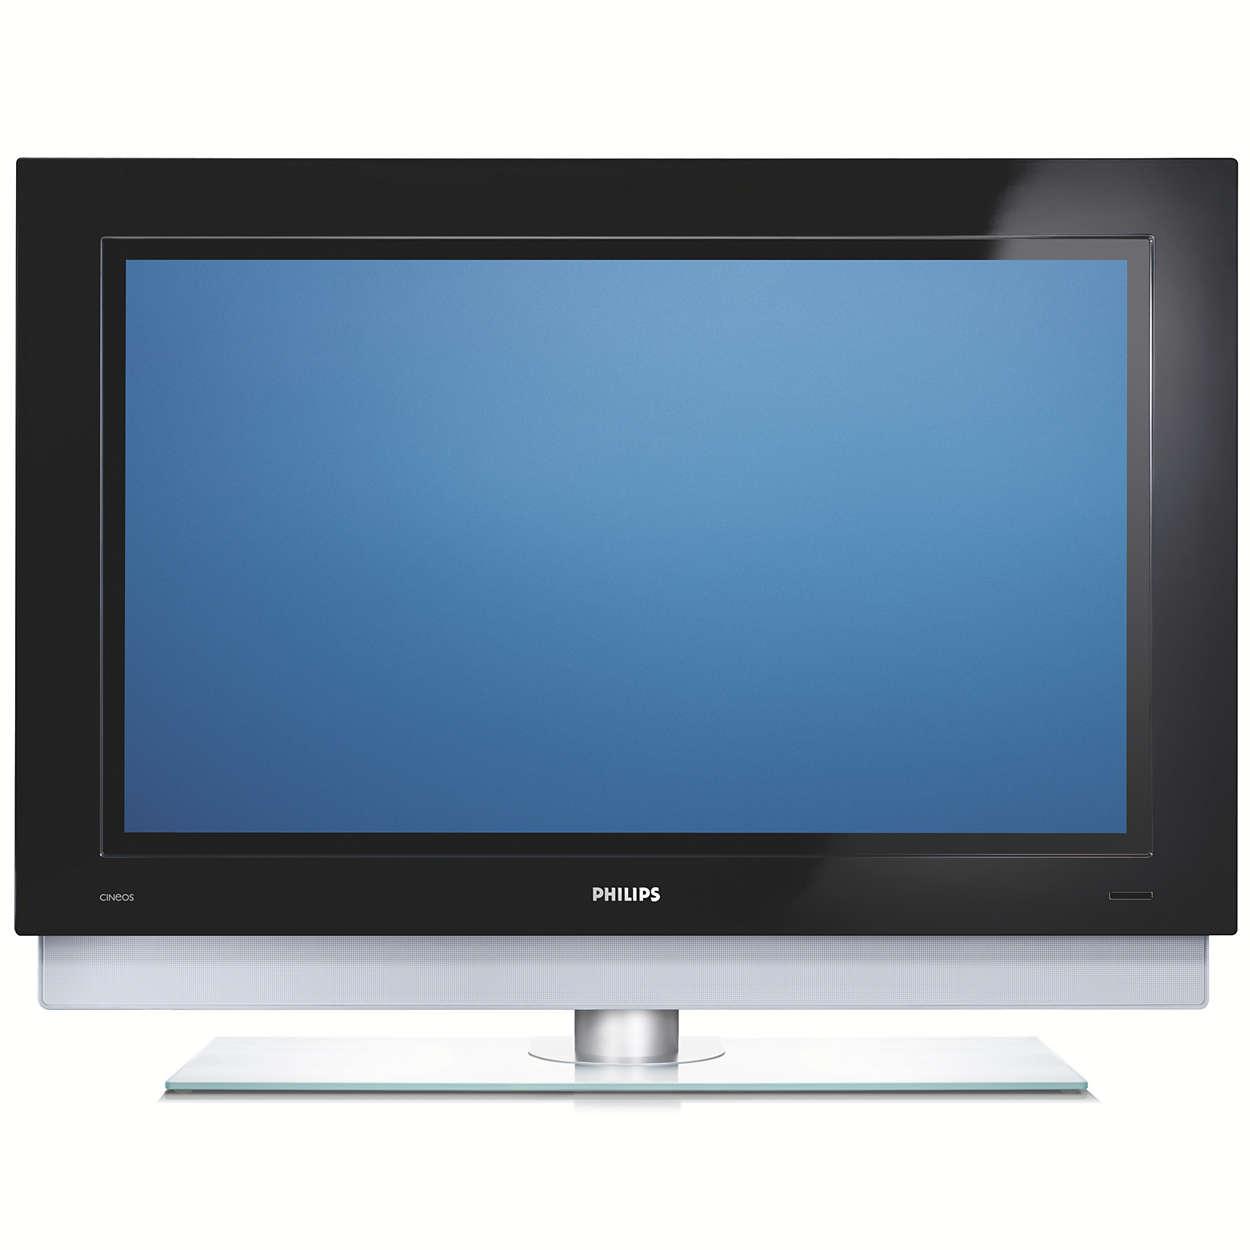 digital breitbild flachbildfernseher 50pf9631d 10 philips. Black Bedroom Furniture Sets. Home Design Ideas